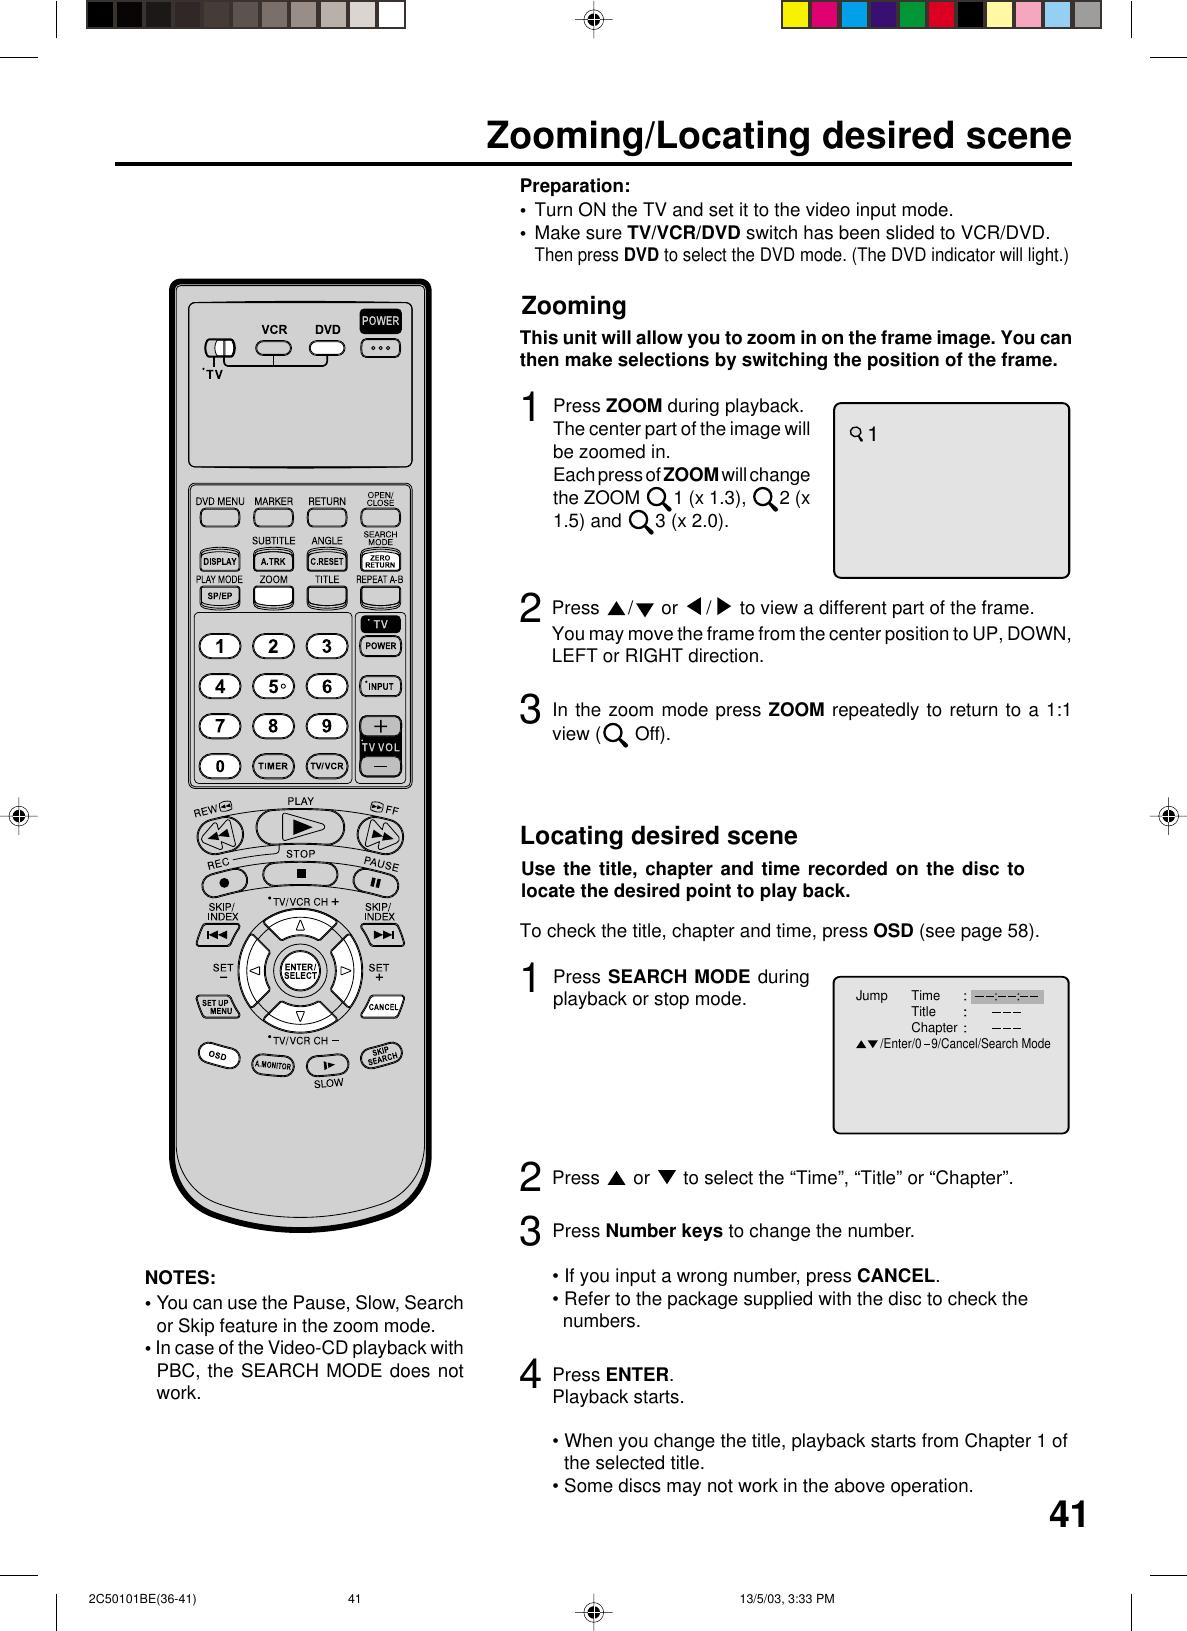 JVC HR XVC20UR User Manual LPT0829 001B